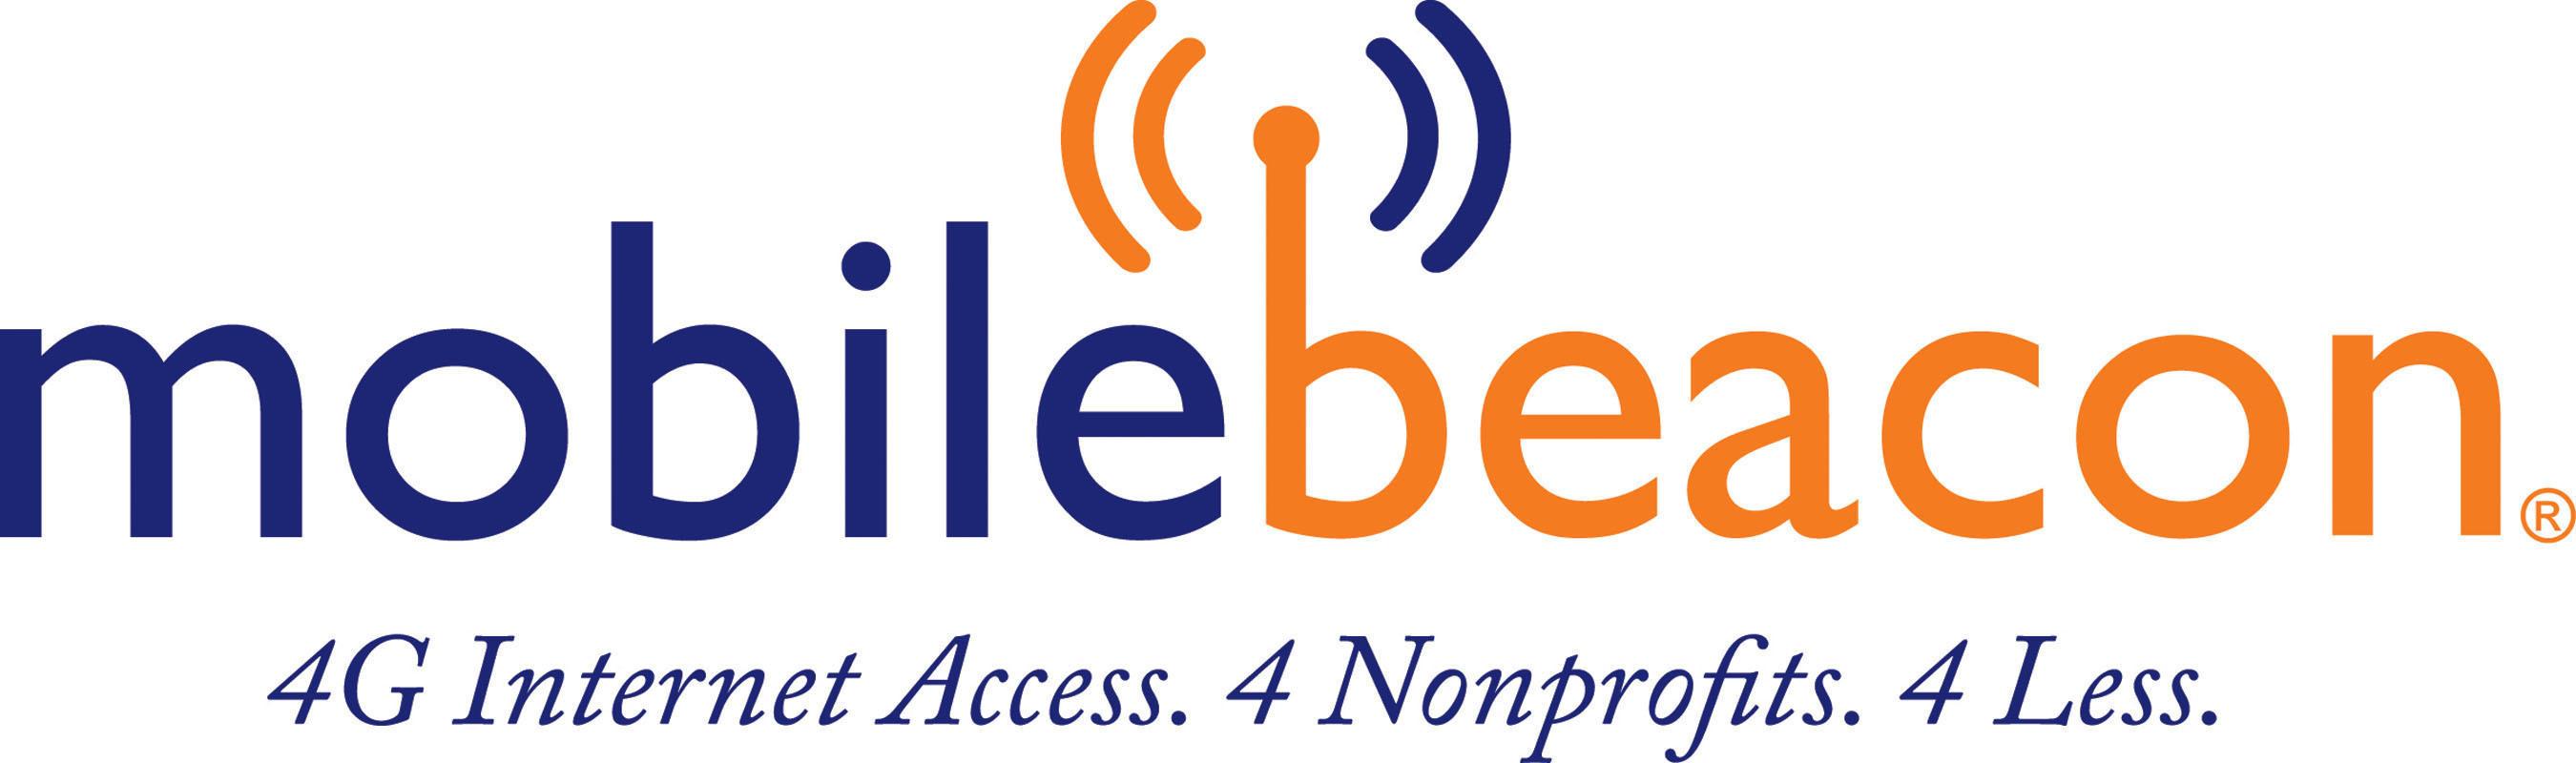 Mobile Beacon Logo. (PRNewsFoto/Mobile Beacon) (PRNewsFoto/)